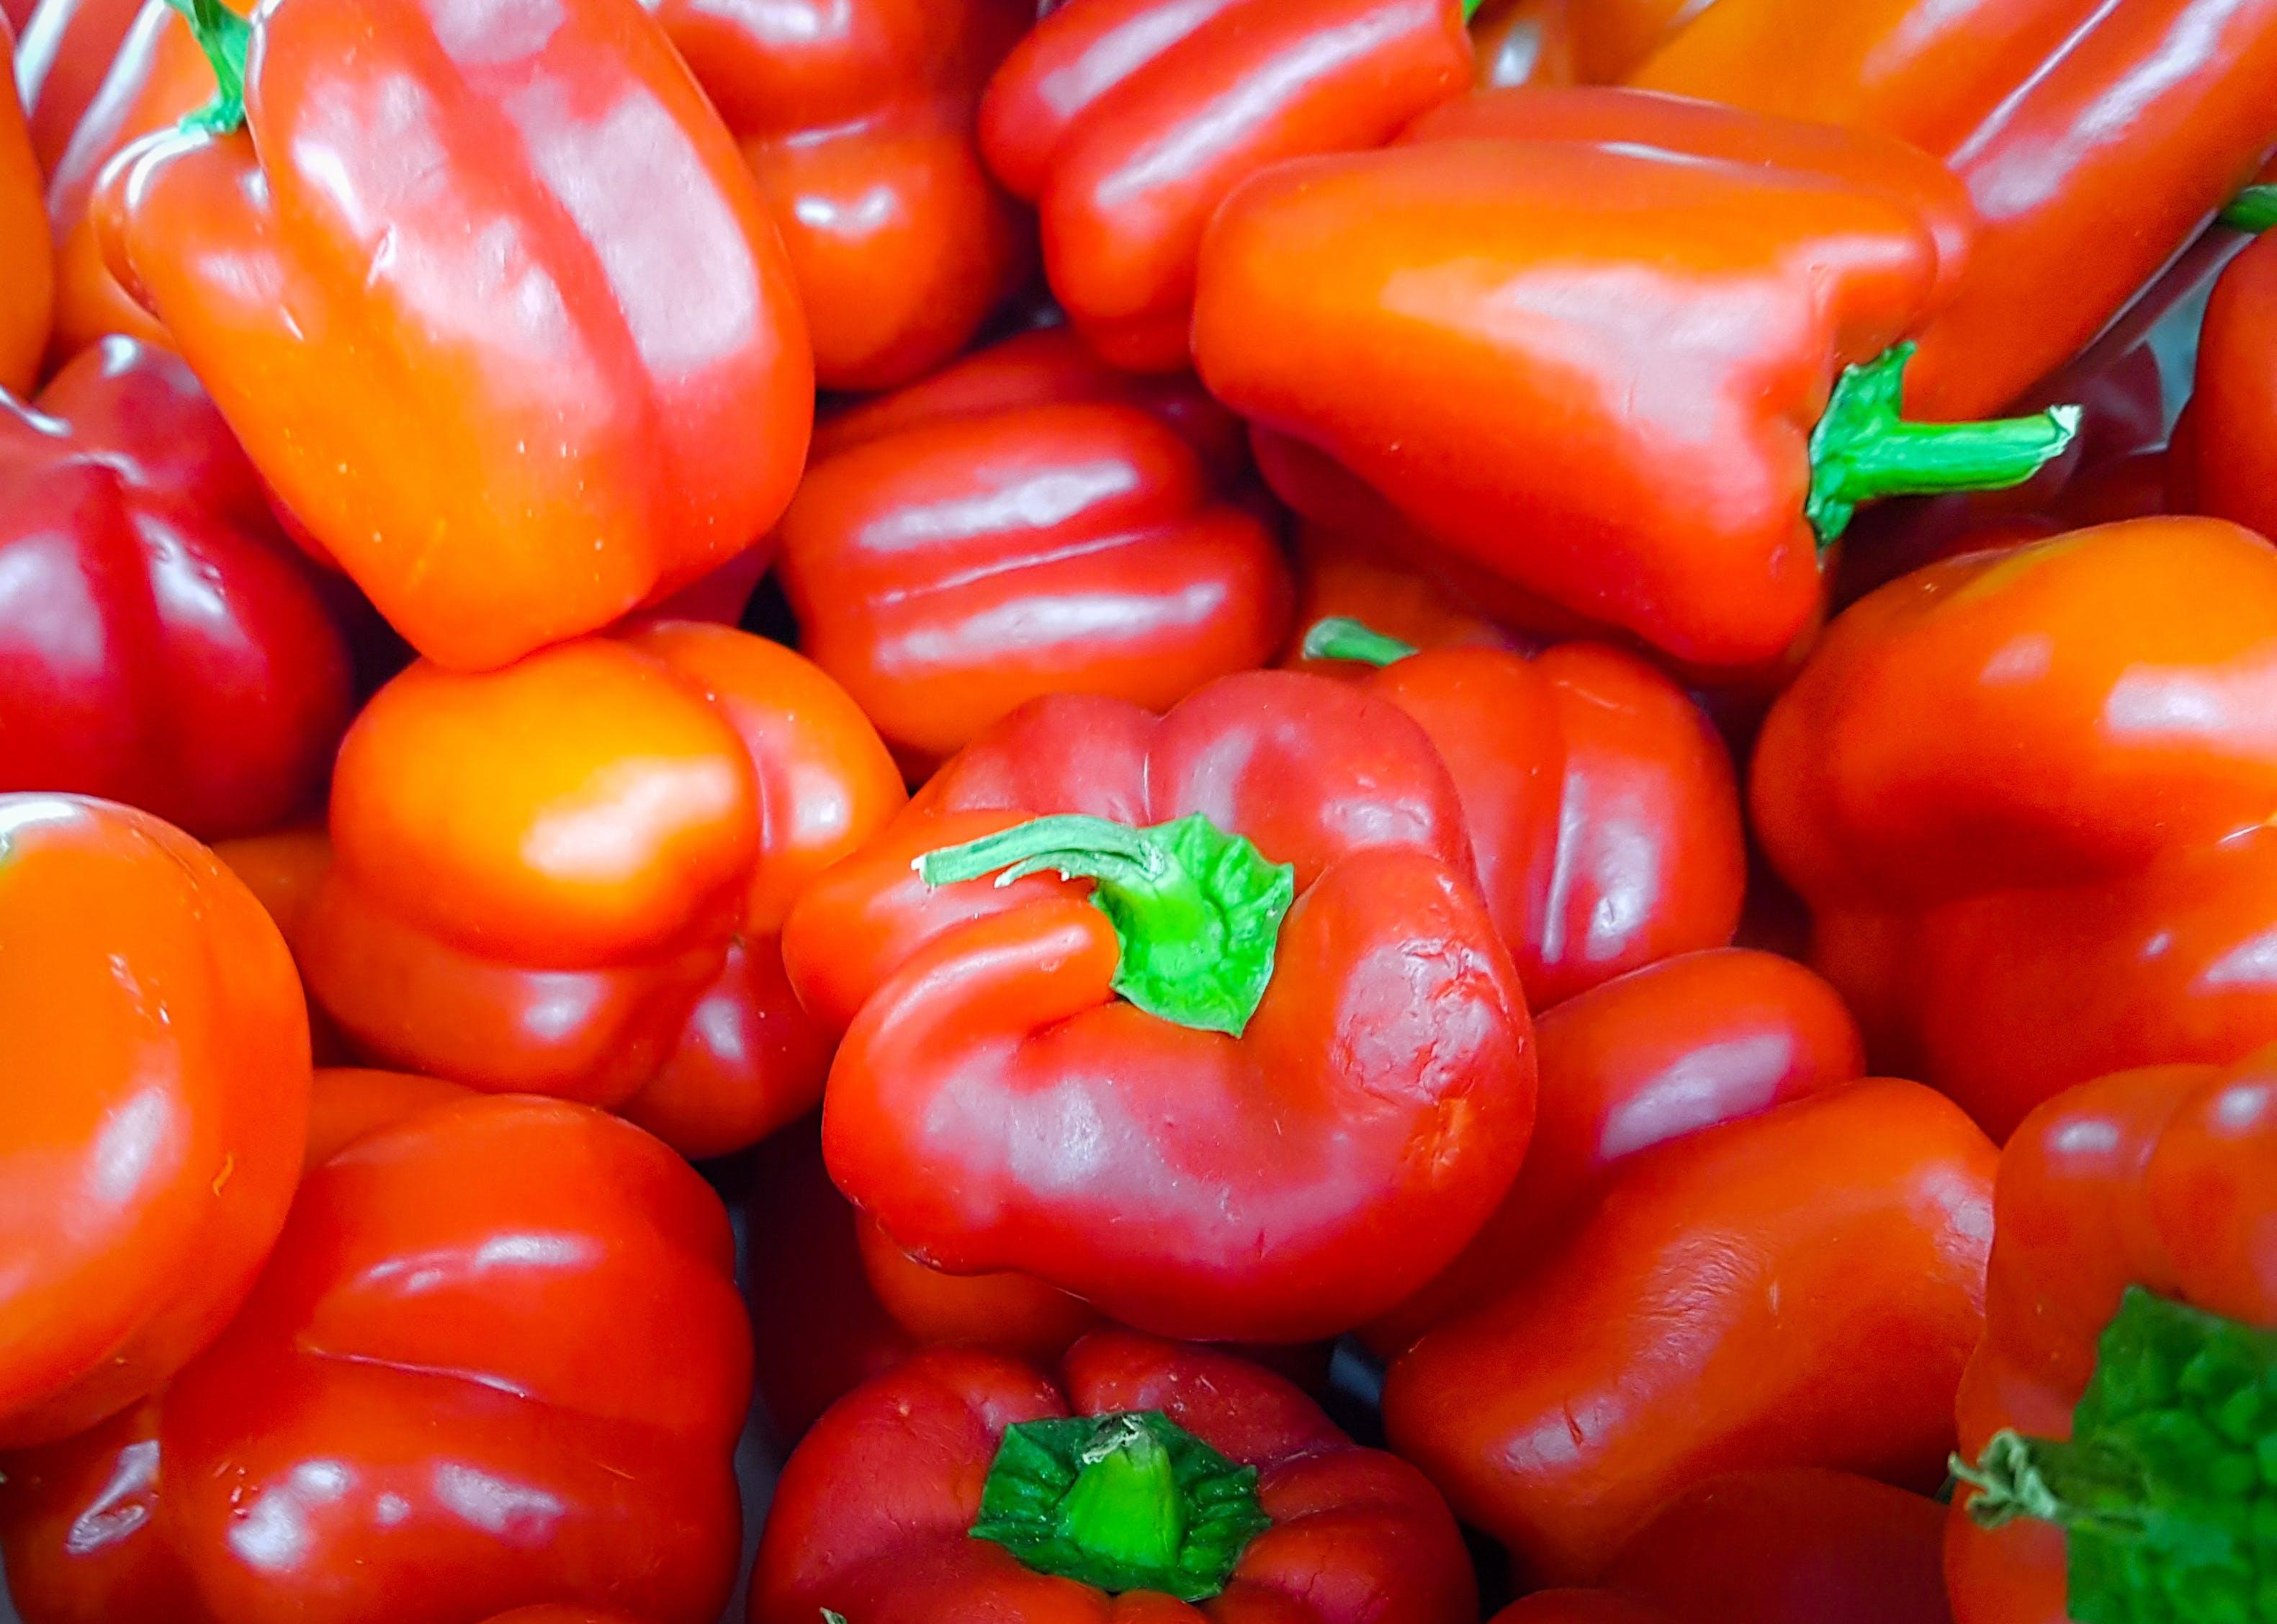 Kostenloses Stock Foto zu chili, heiß, peperoni, rot